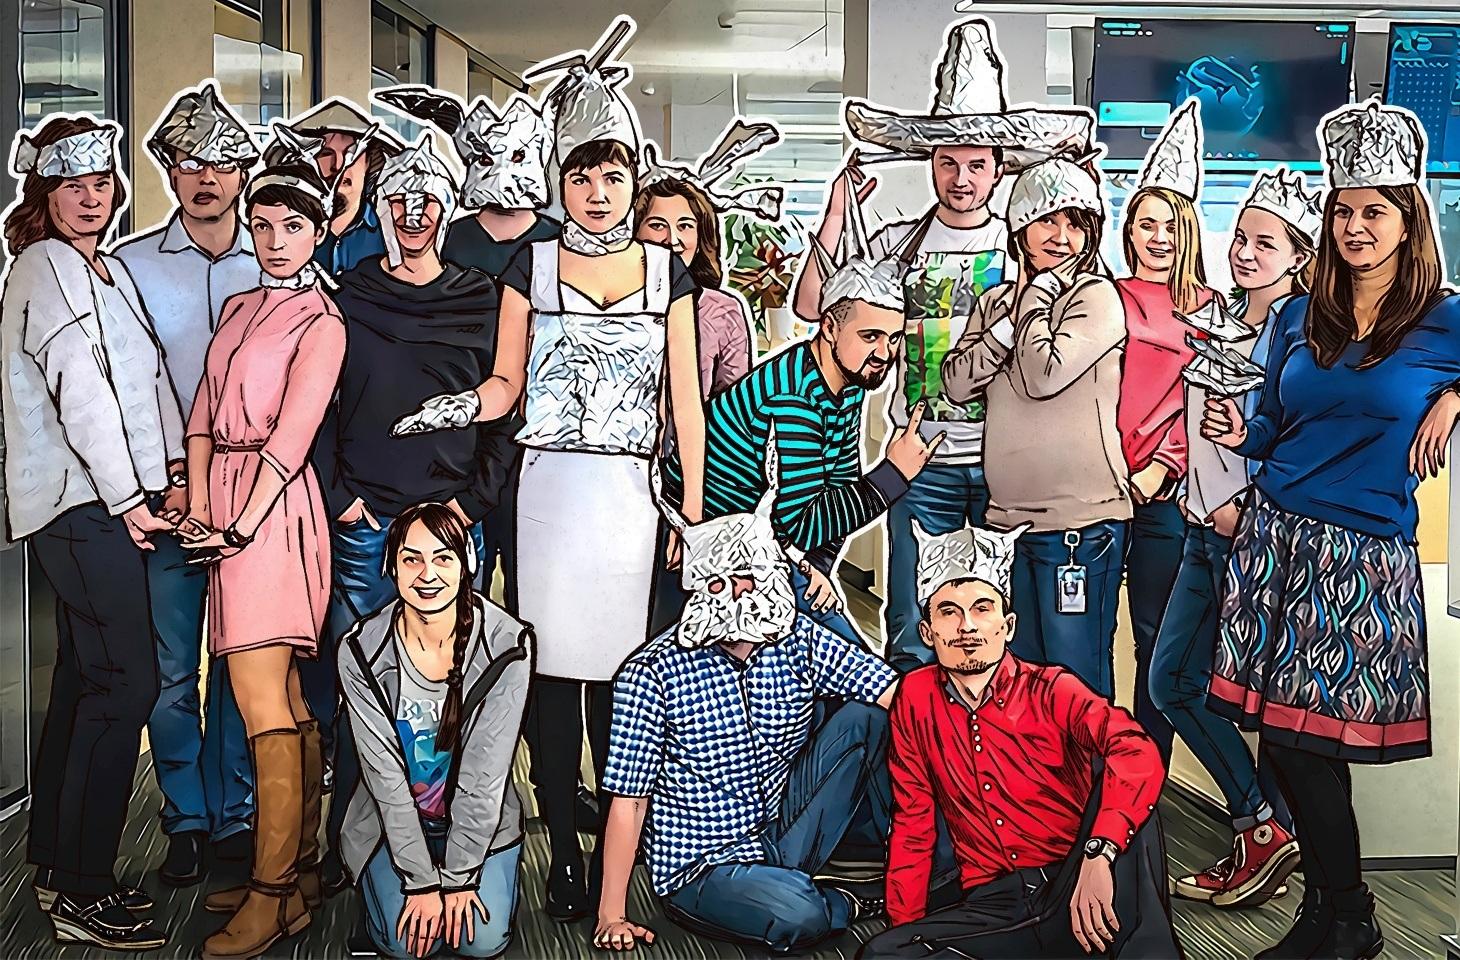 International Tinfoil Hat Day 2017